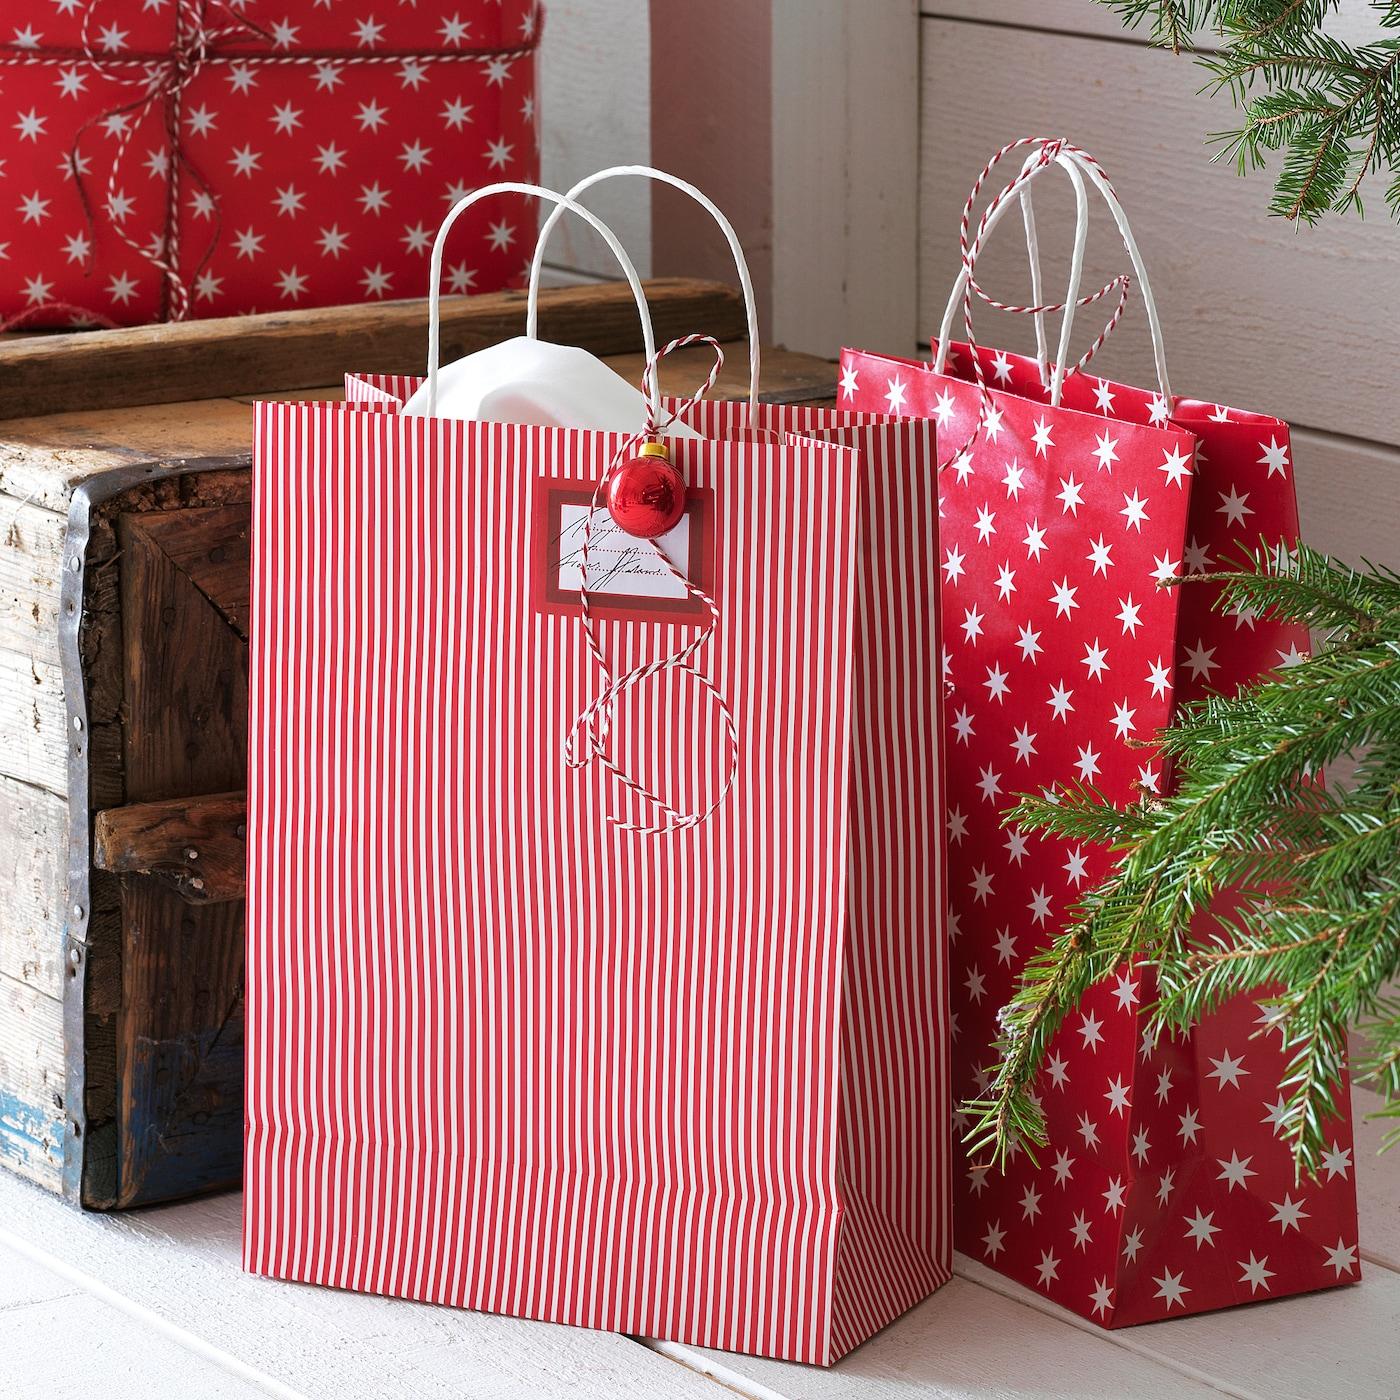 VINTER 2020 Bolsa regalo Navidad motivo estrellamotivo a rayas rojoblanco 26x35 cm